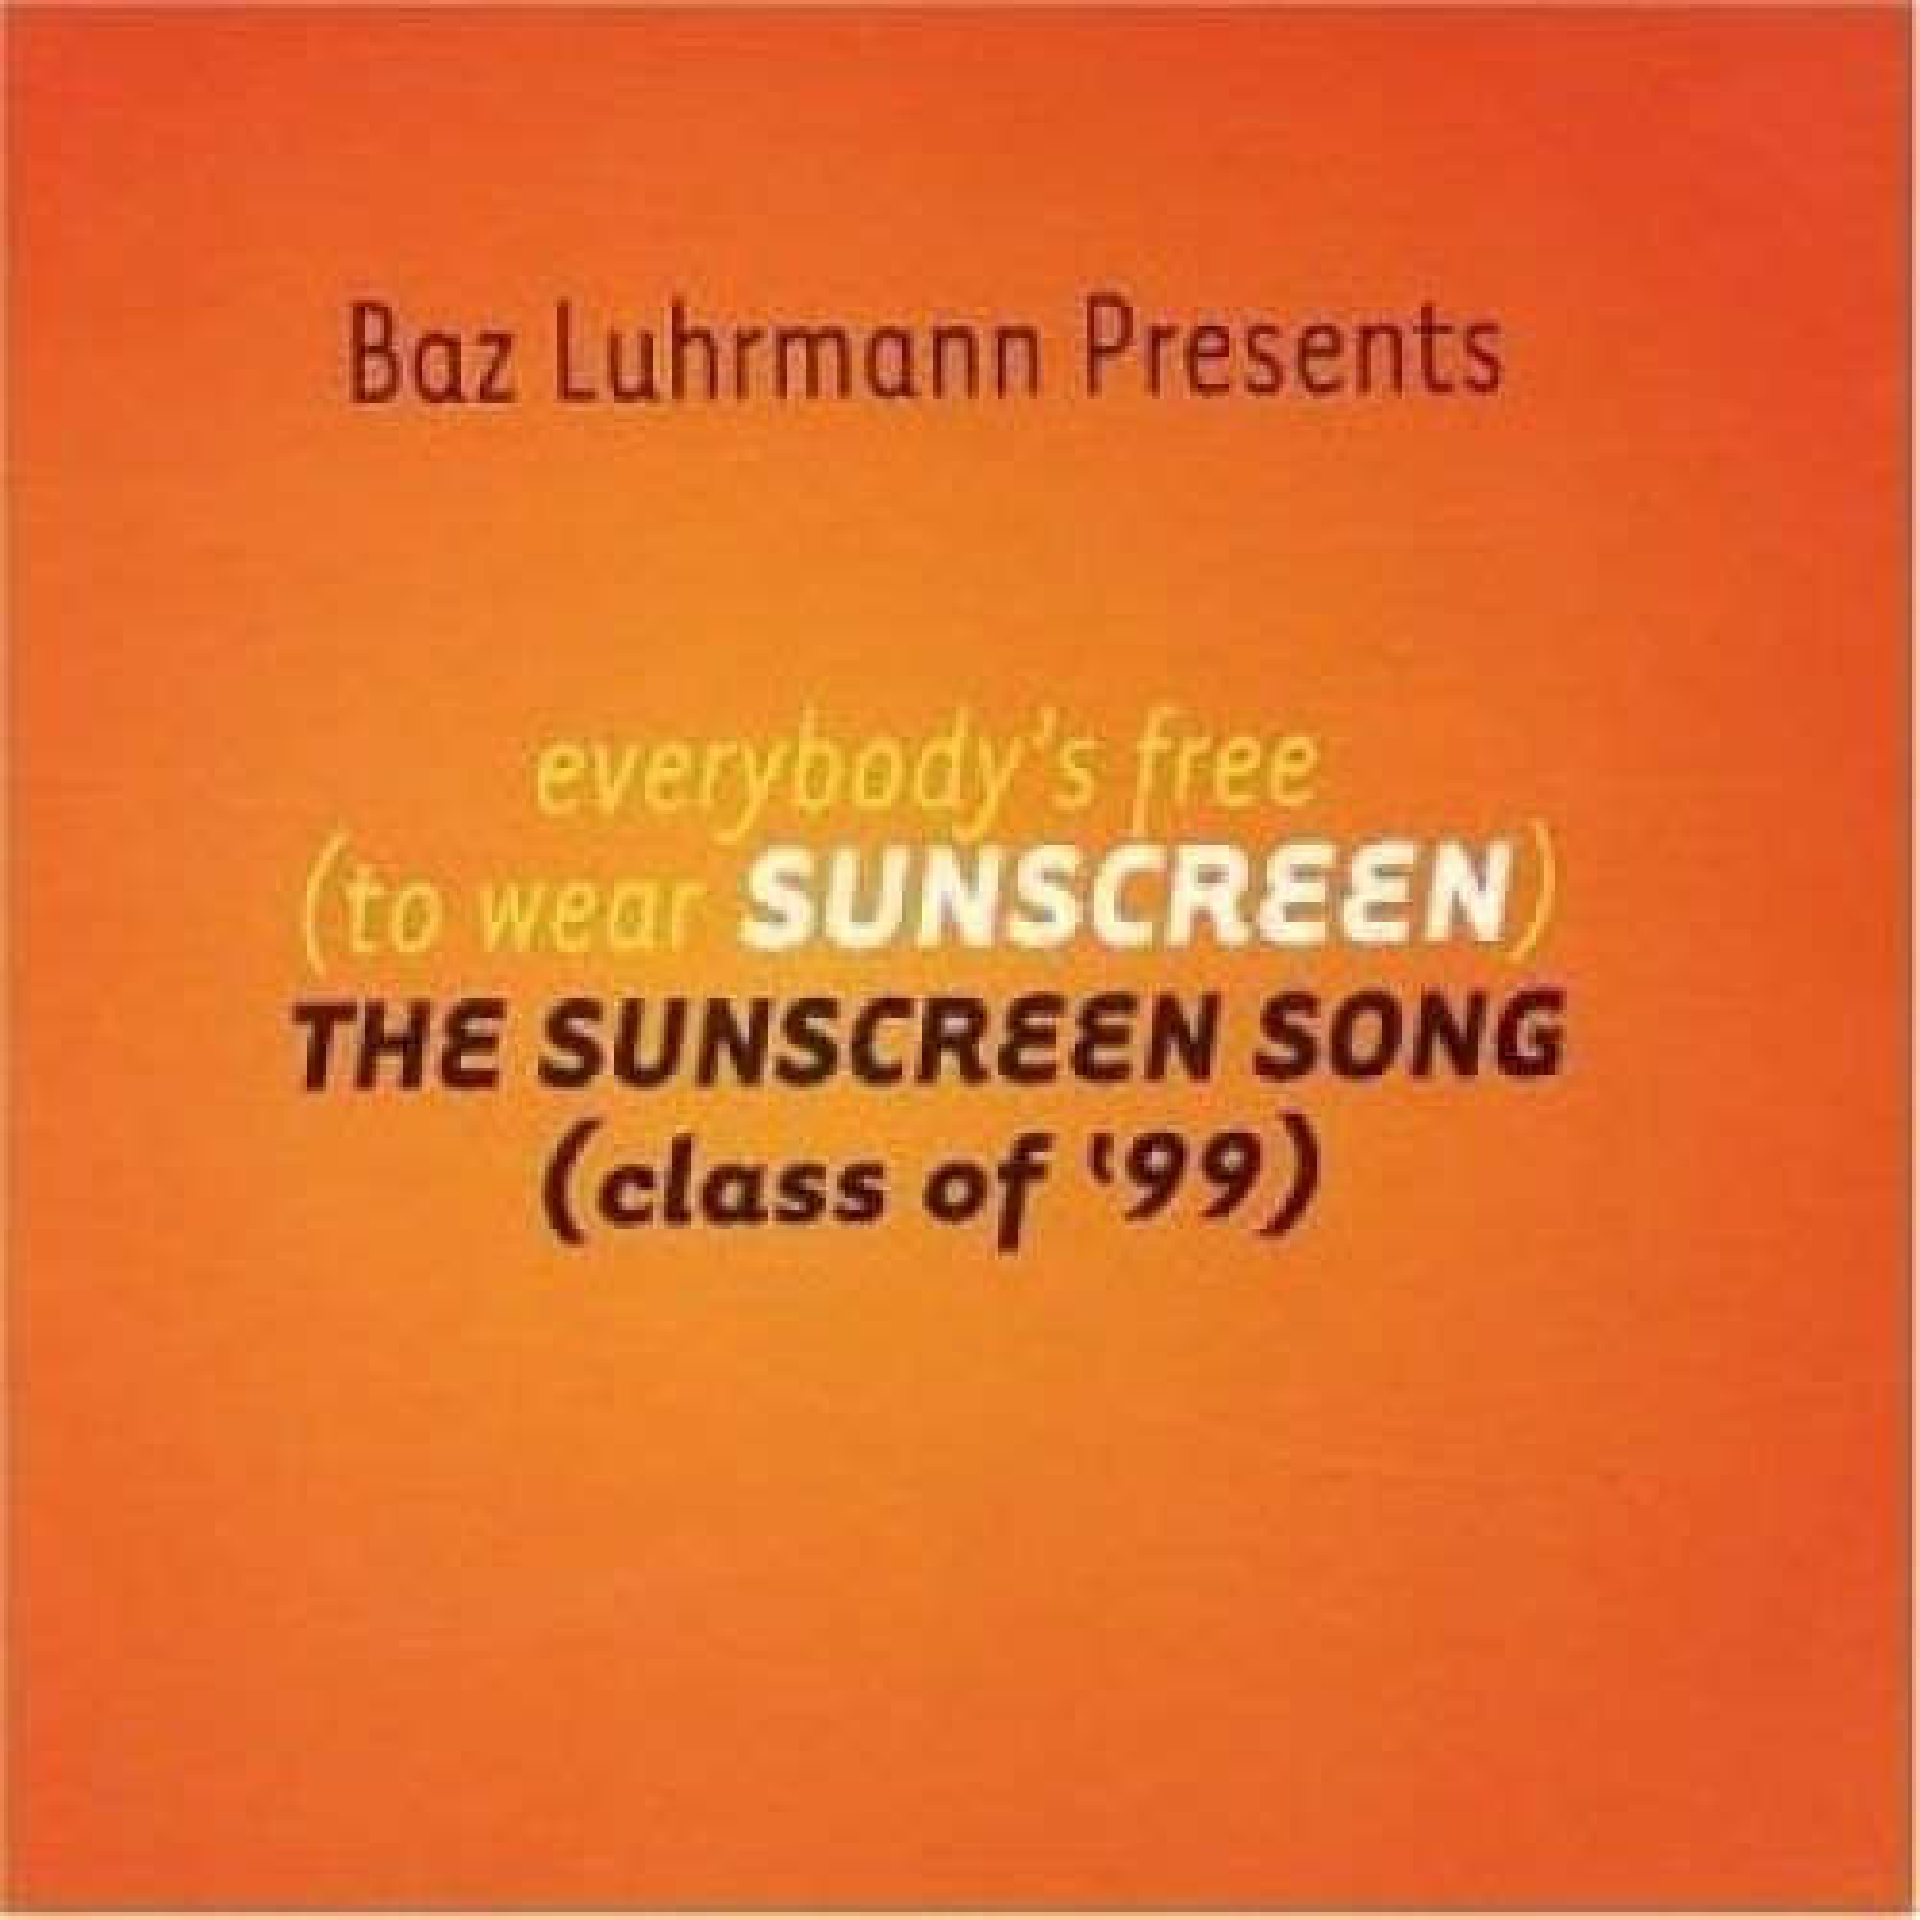 EVERYBODY'S FREE TO WEAR SUNSCREEN